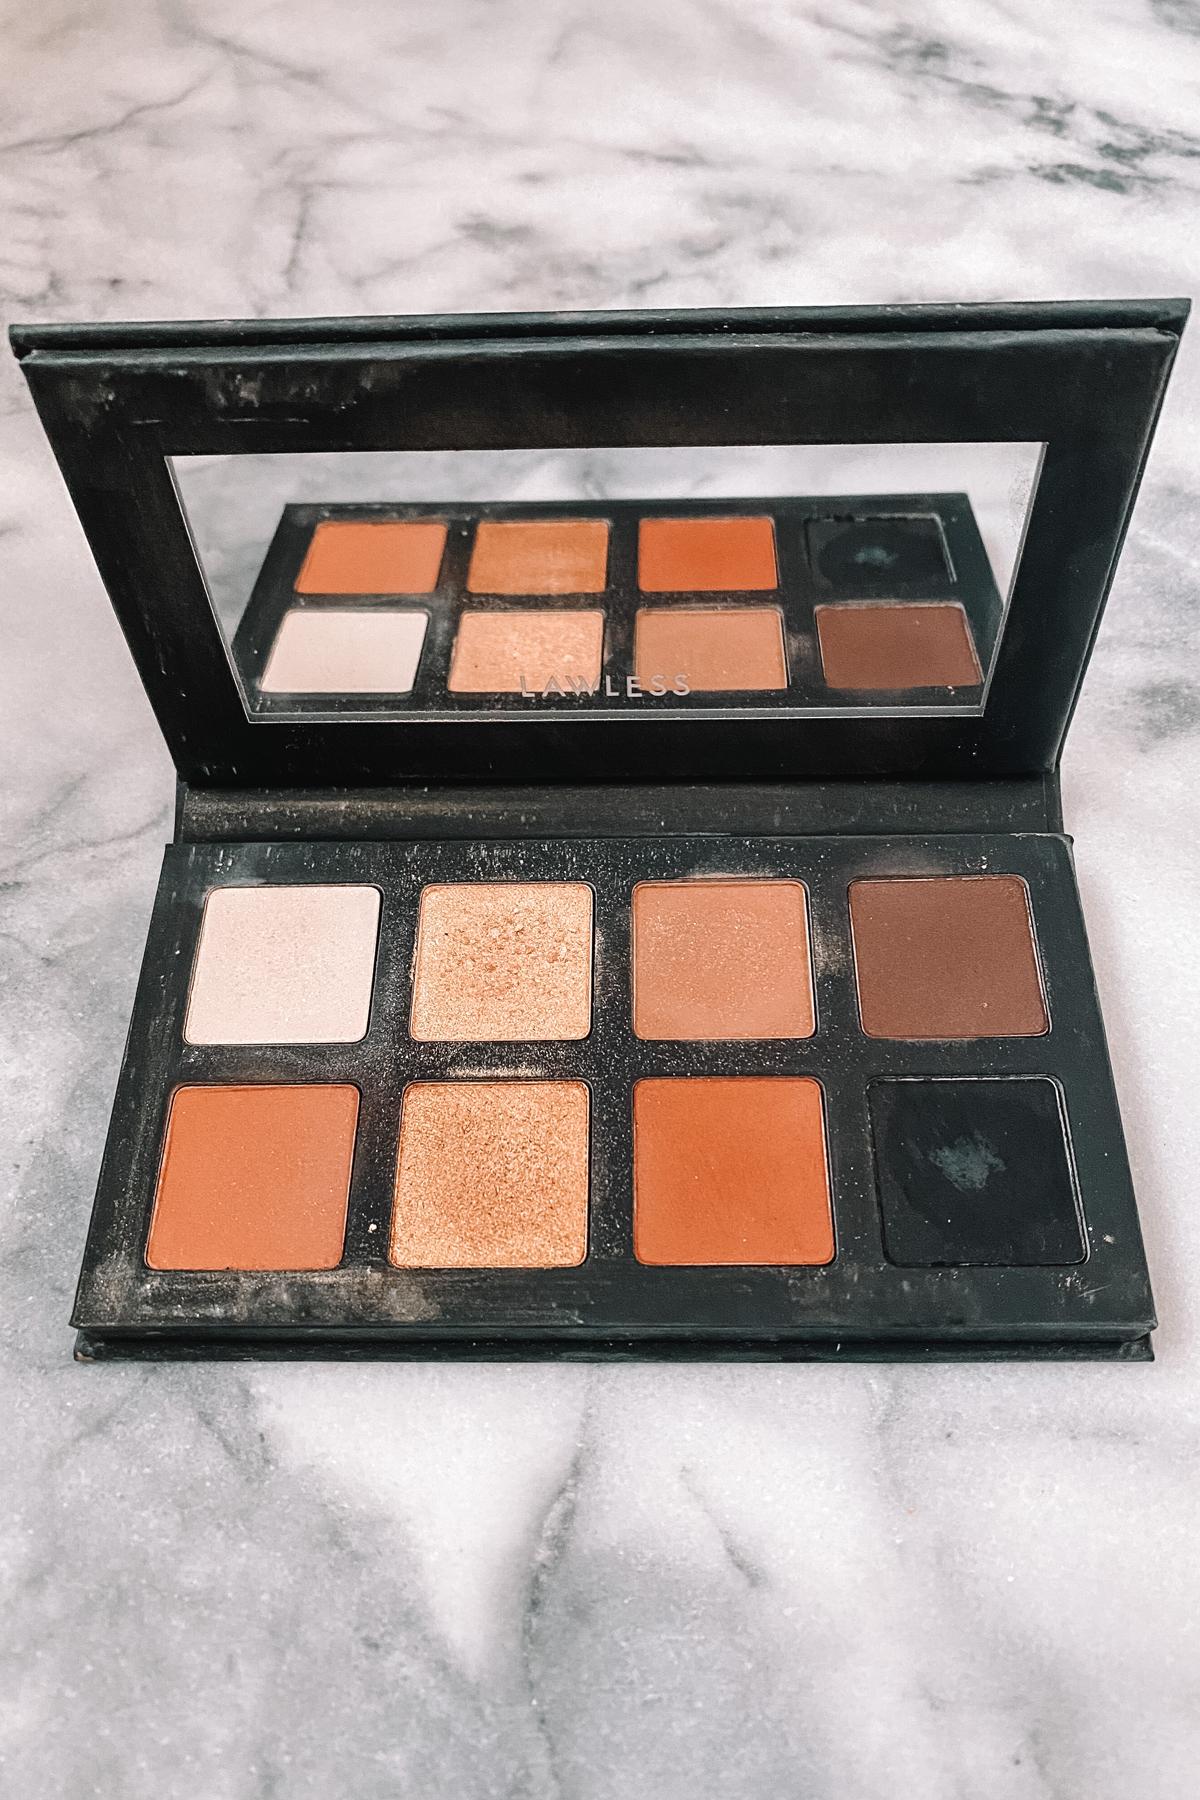 Fashion Jackson Sephora Lawless Eyeshadow Palette